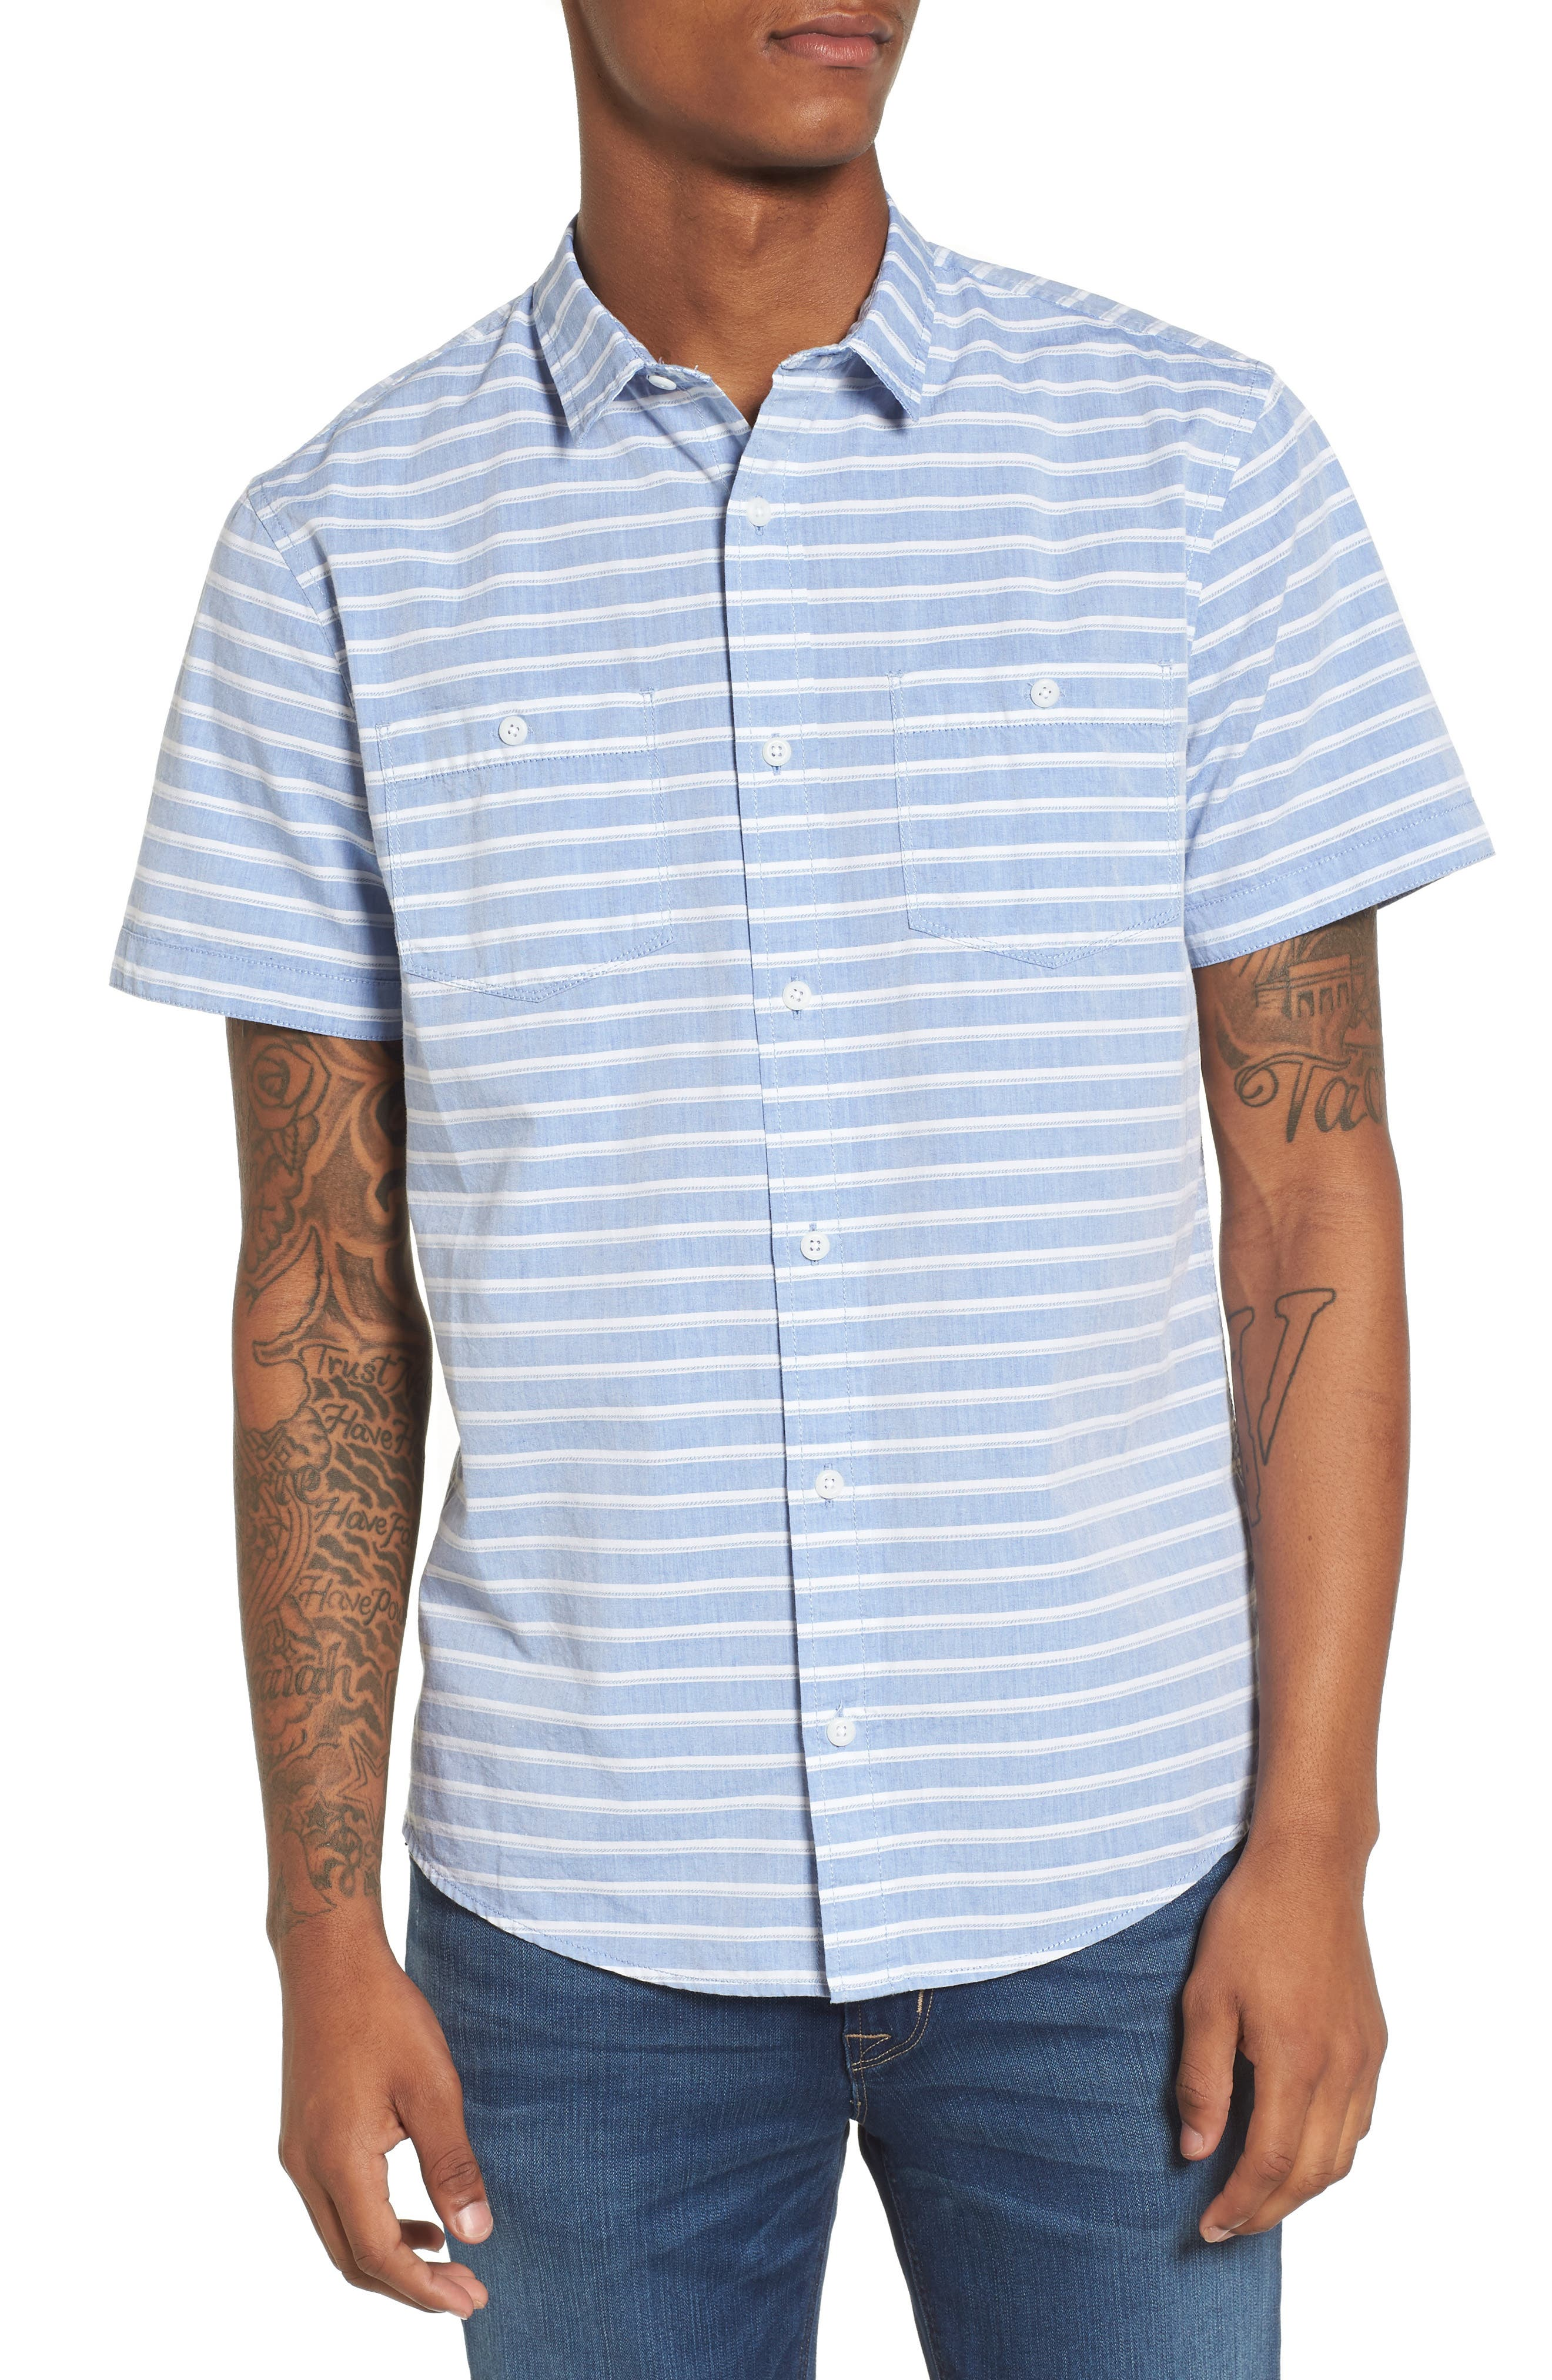 The Rail Texture Stripe Short Sleeve Shirt